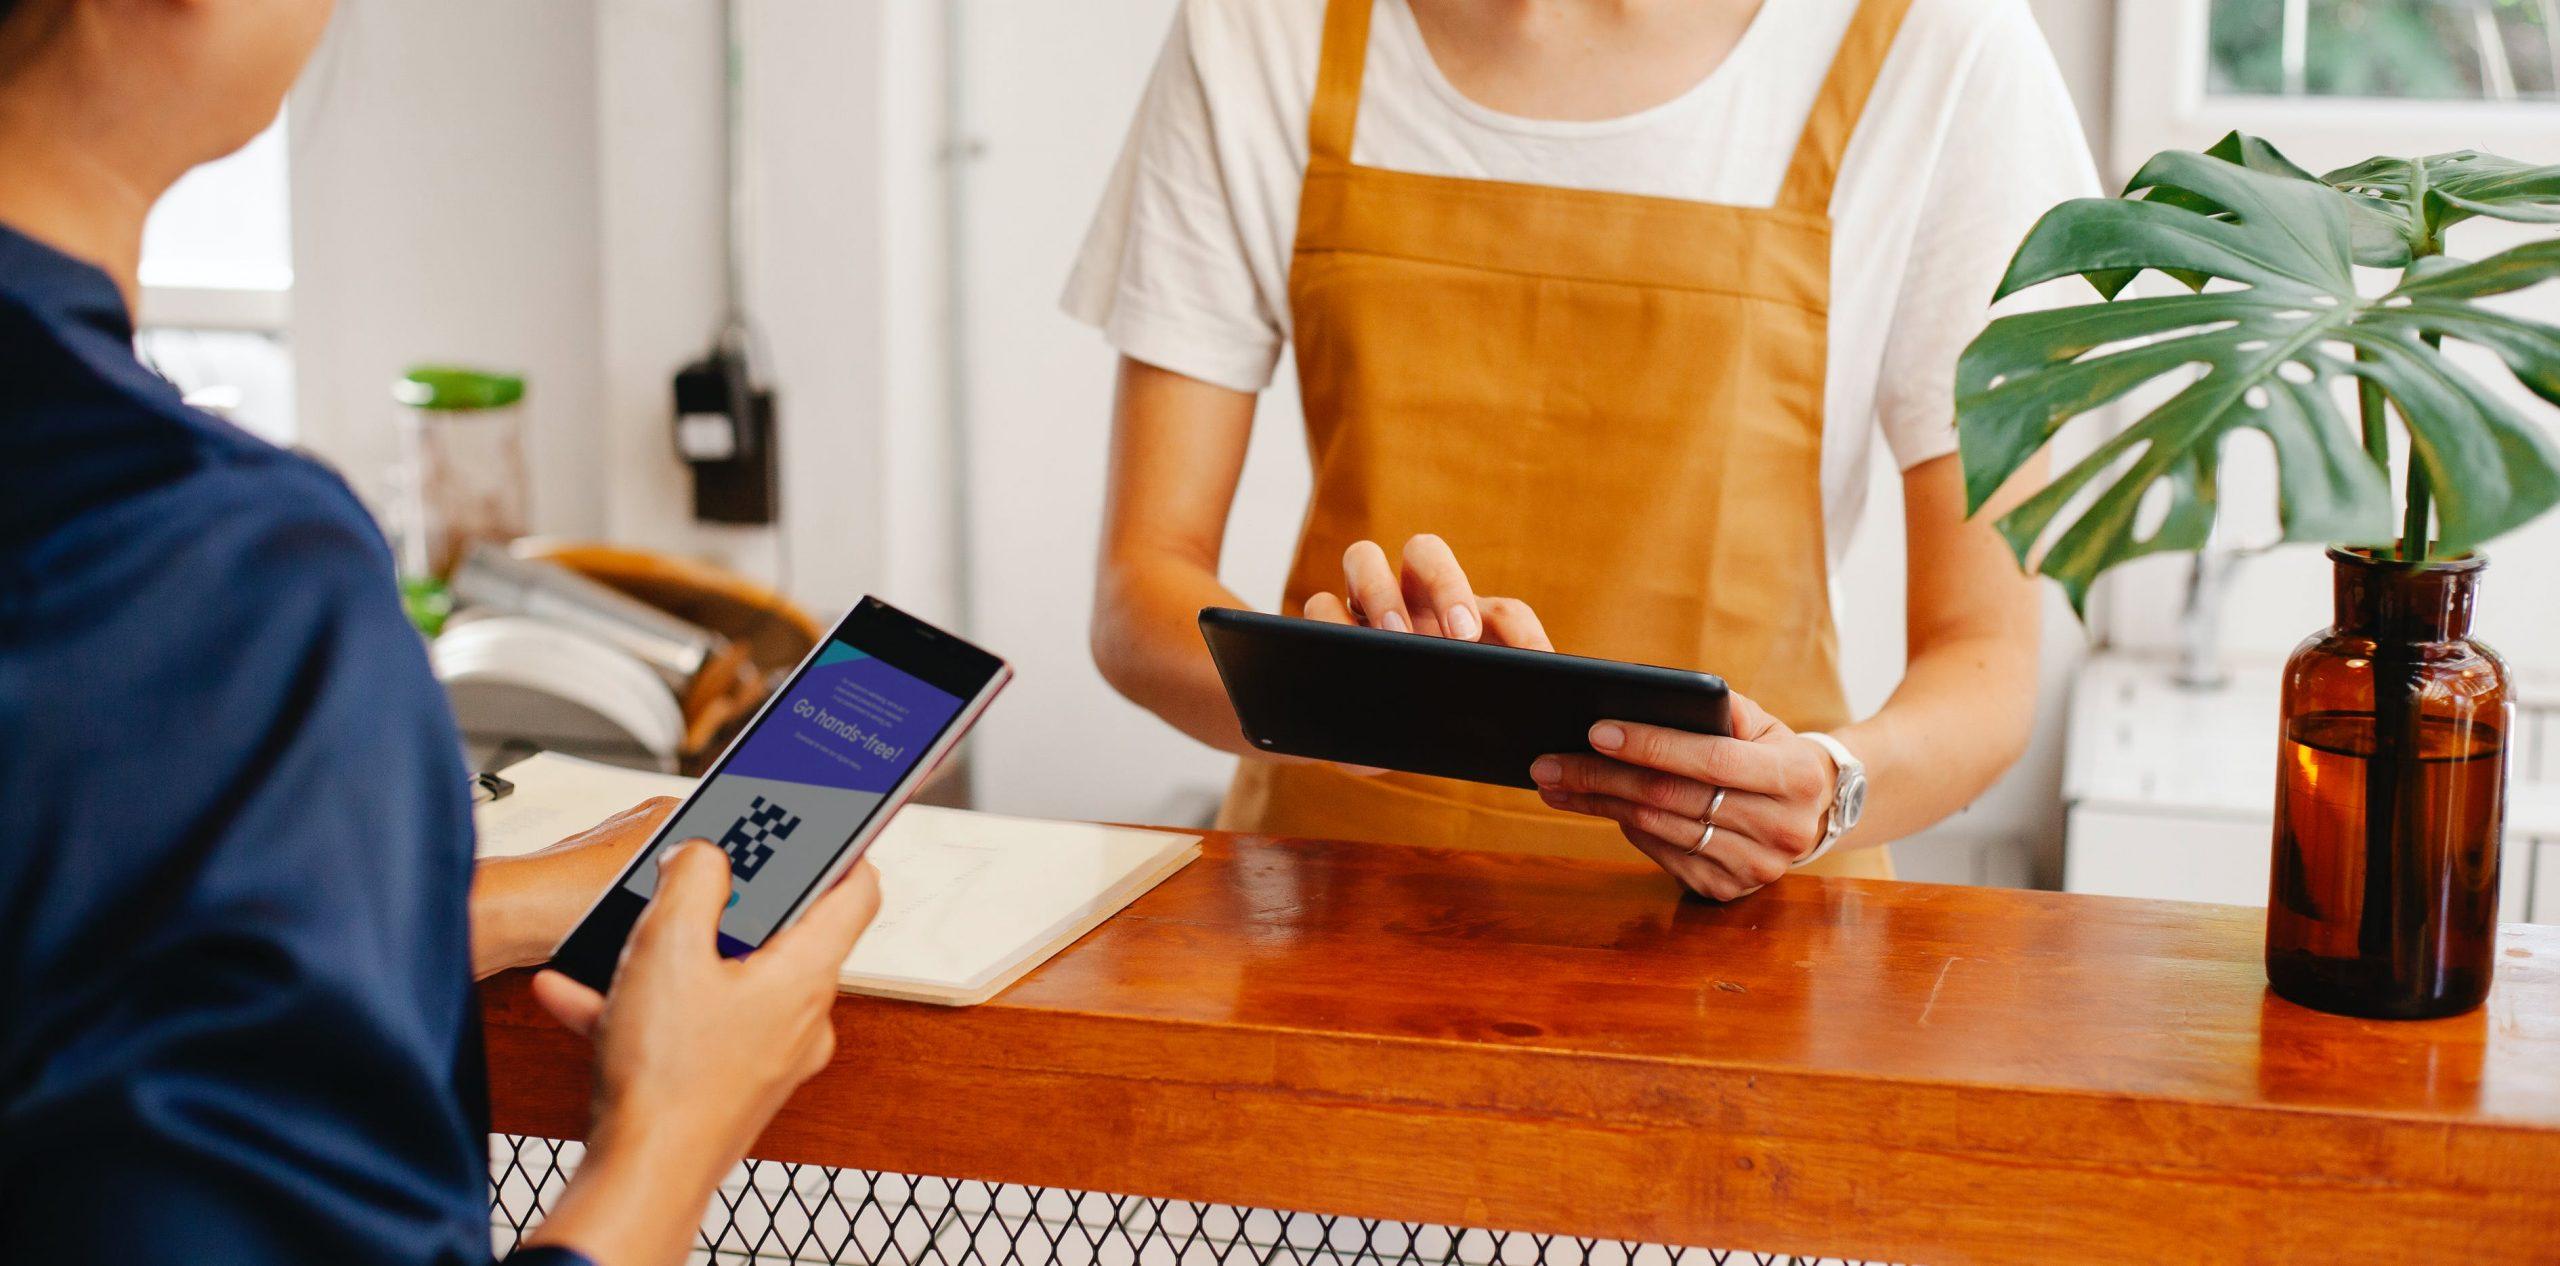 processamento de pagamento digital qr code